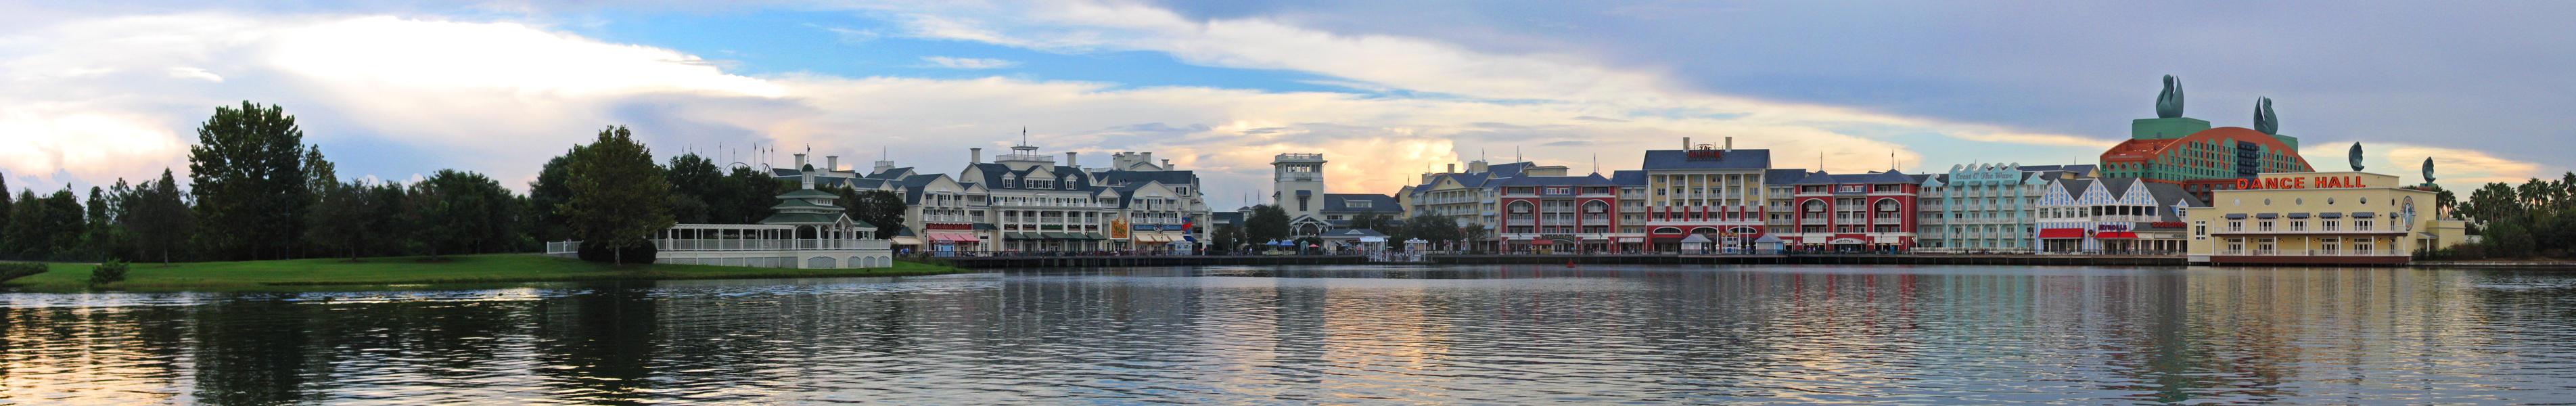 Boardwalk Inn 30 Panorama by AreteStock